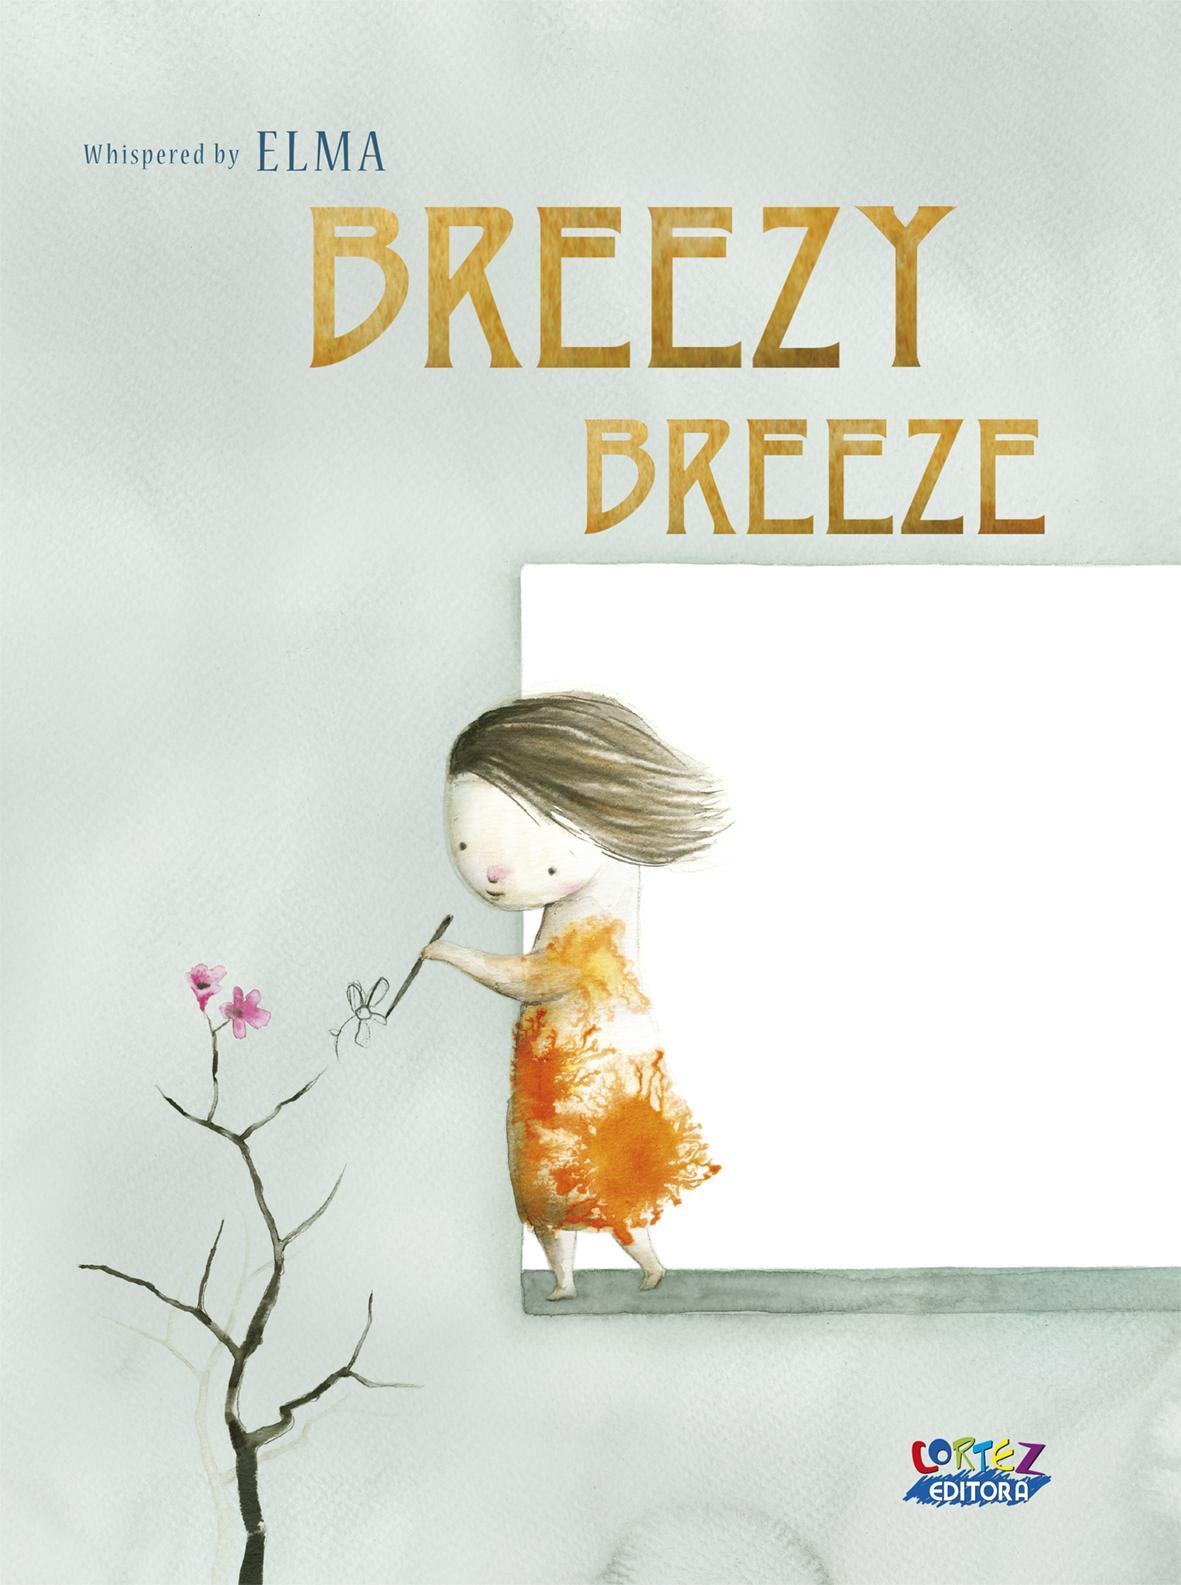 Breezy breeze